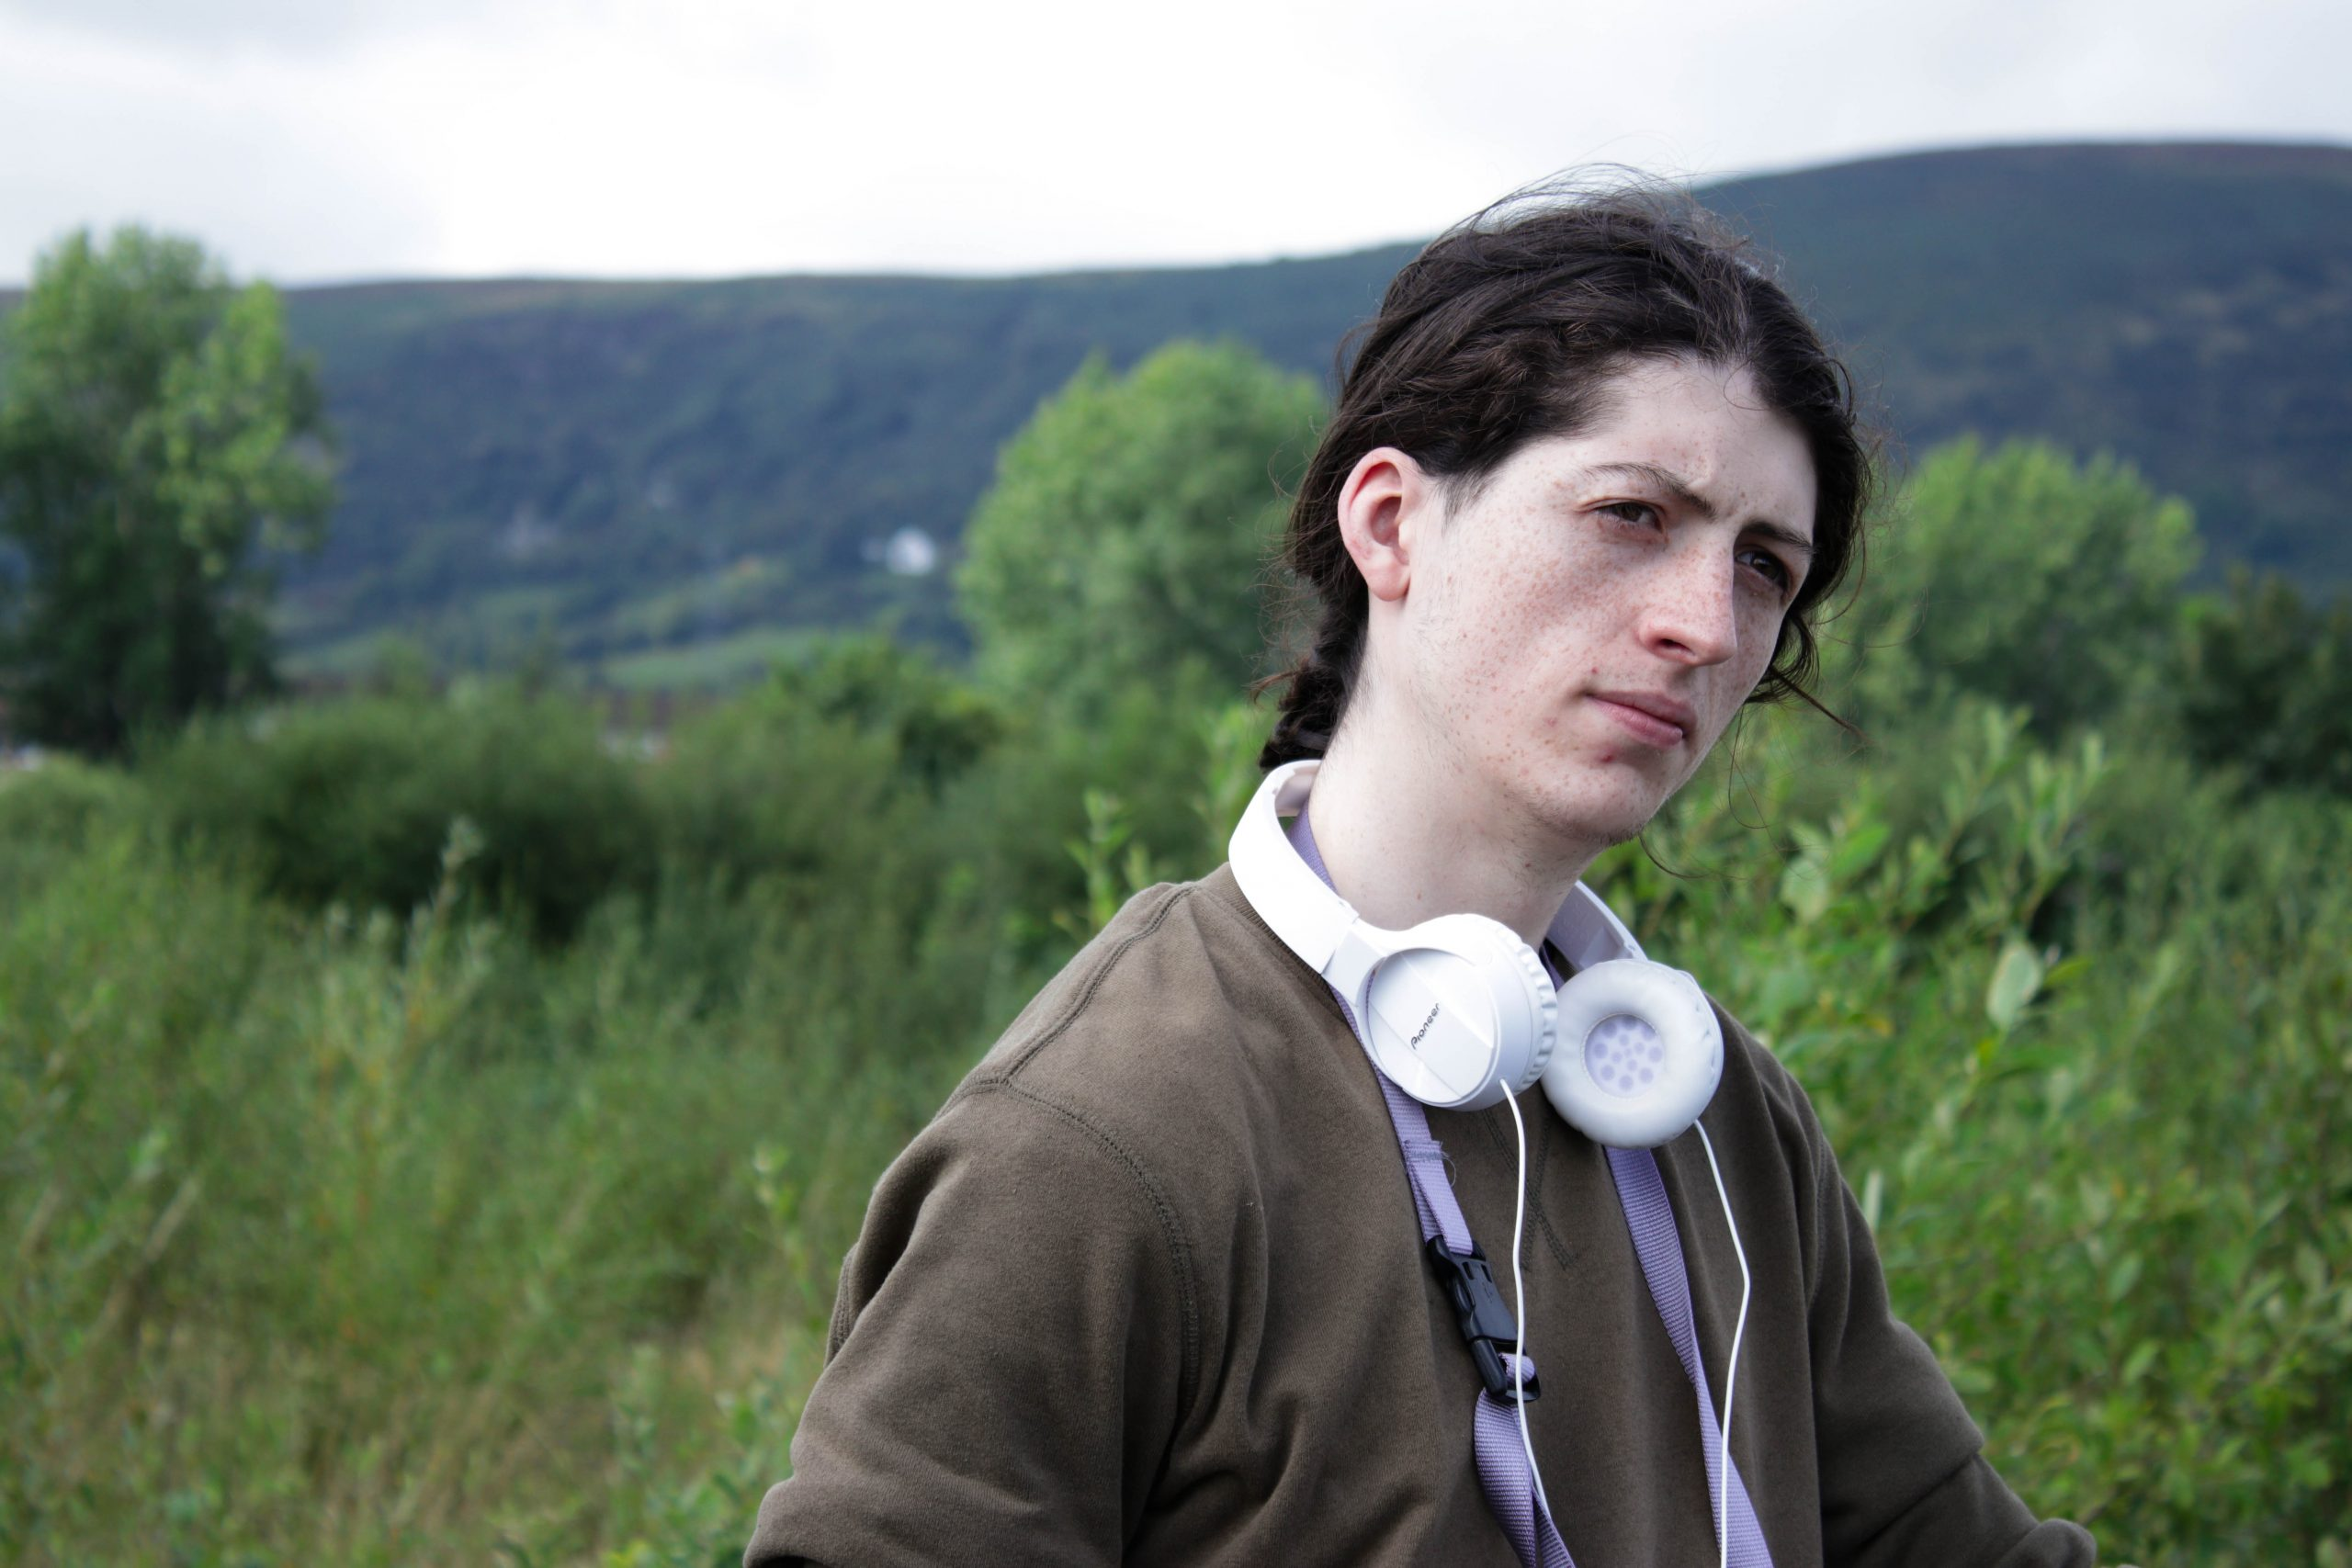 Northern Ireland up for three UK youth film awards